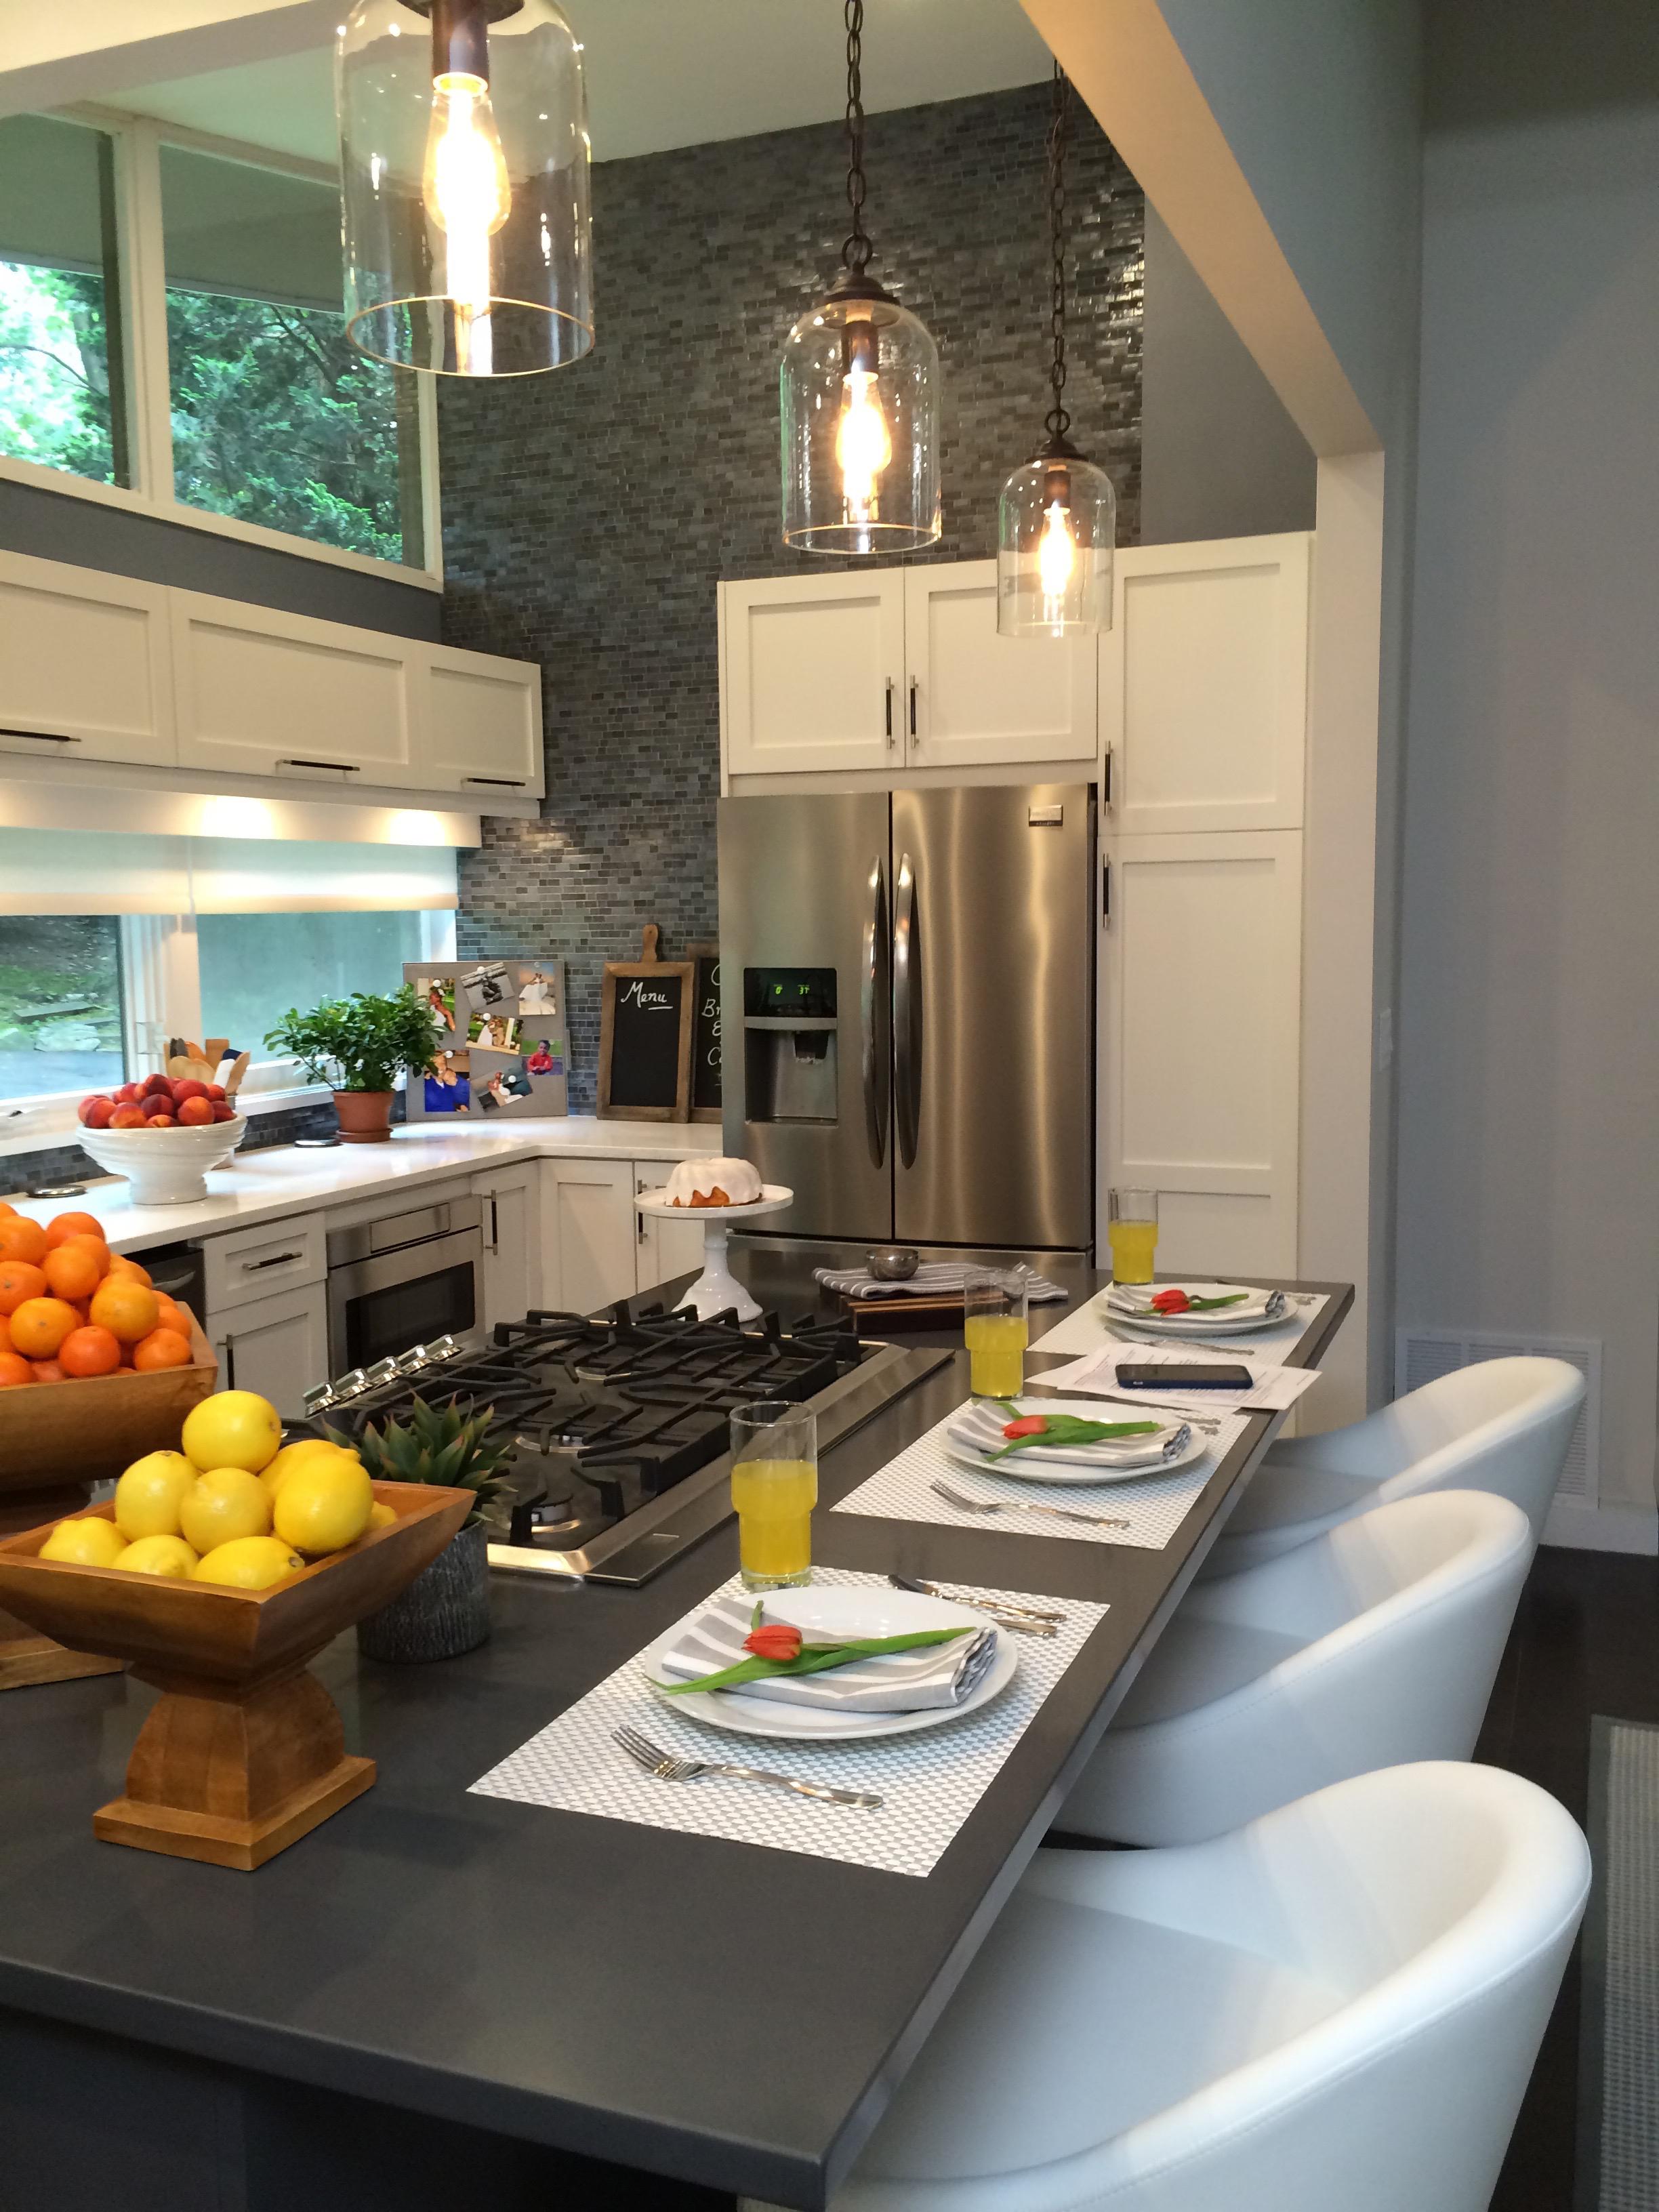 Kim A Mitchell_Design Lead_HGTV_The Property Brothers_Season 6_Episode 9_Kitchen_Blue Glass Tile Backsplash_Emtek Hardware_Glass Pendants_Modern Kitchen_2017.jpg